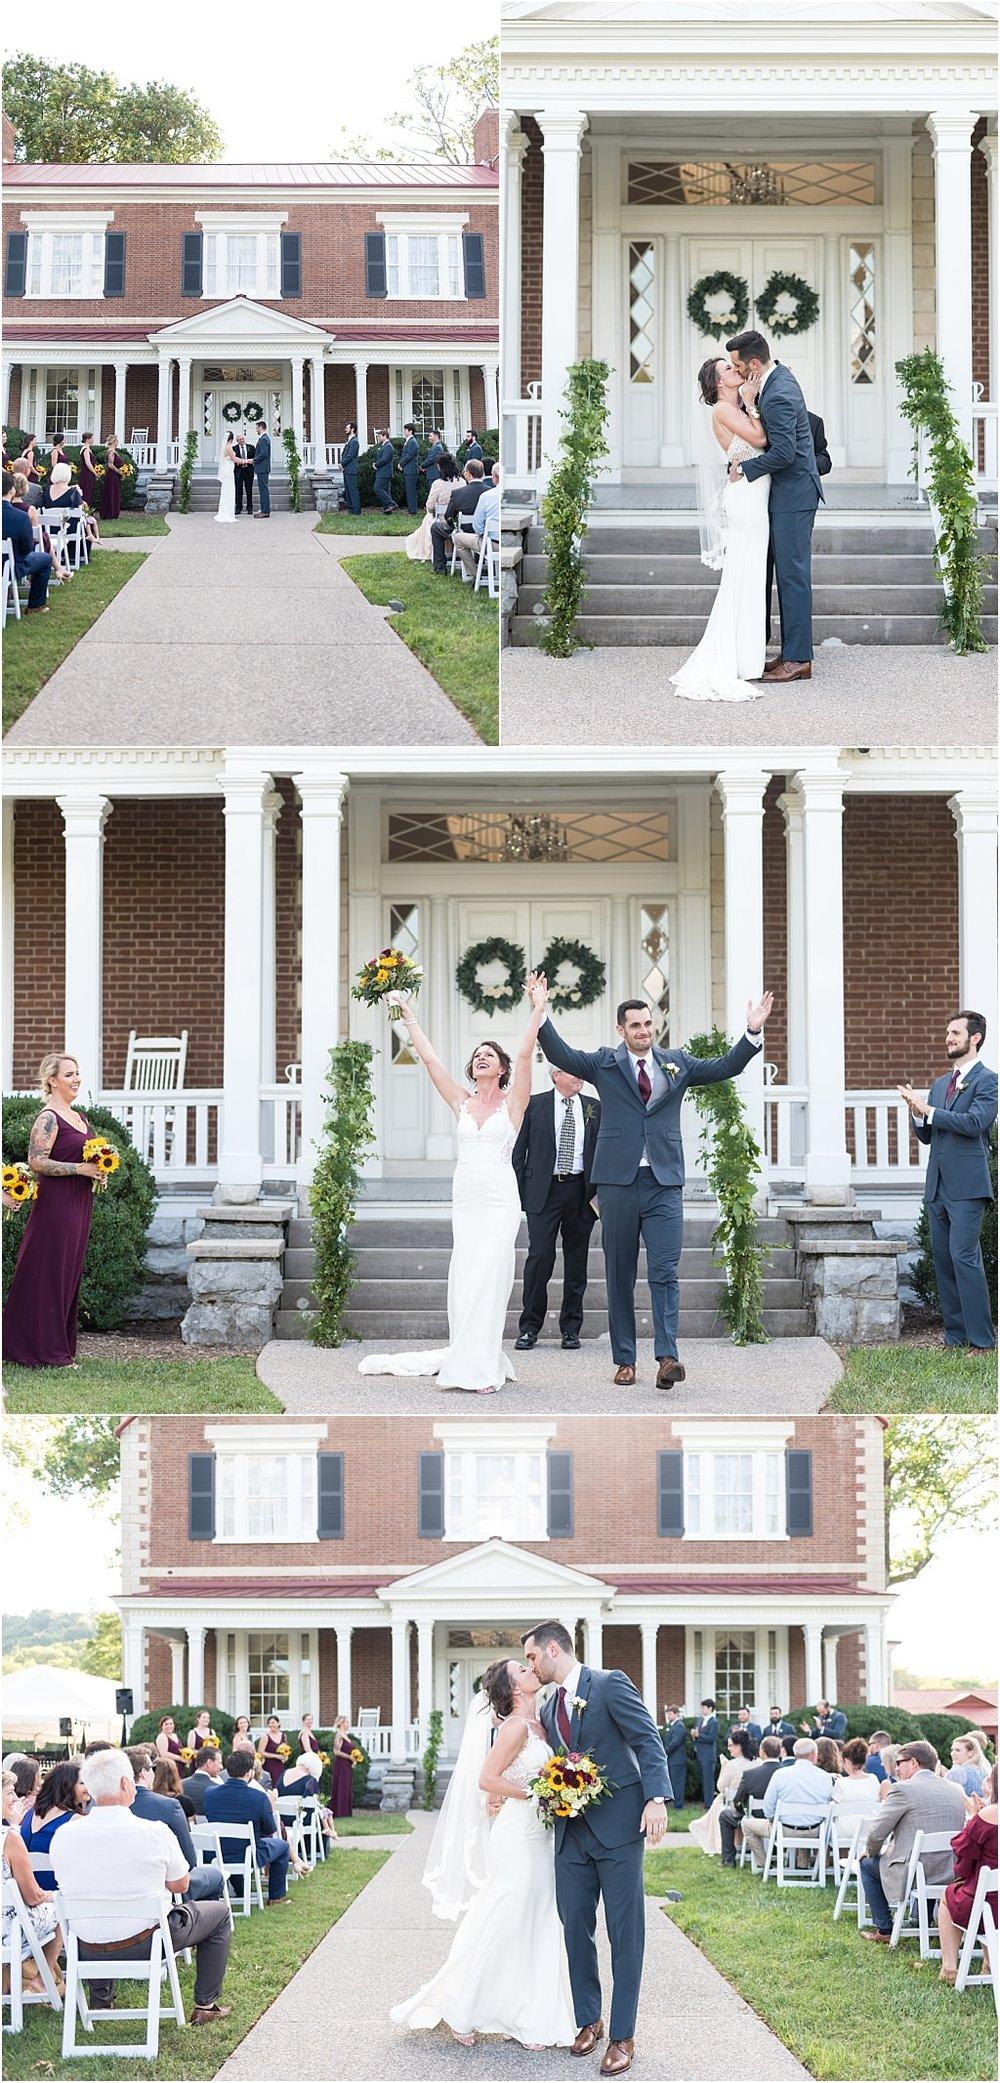 Jordan-and-Anna-Ravenswood-Mansion-Wedding-in-Brentwood-TN-Nashville-Wedding-Photographers+7